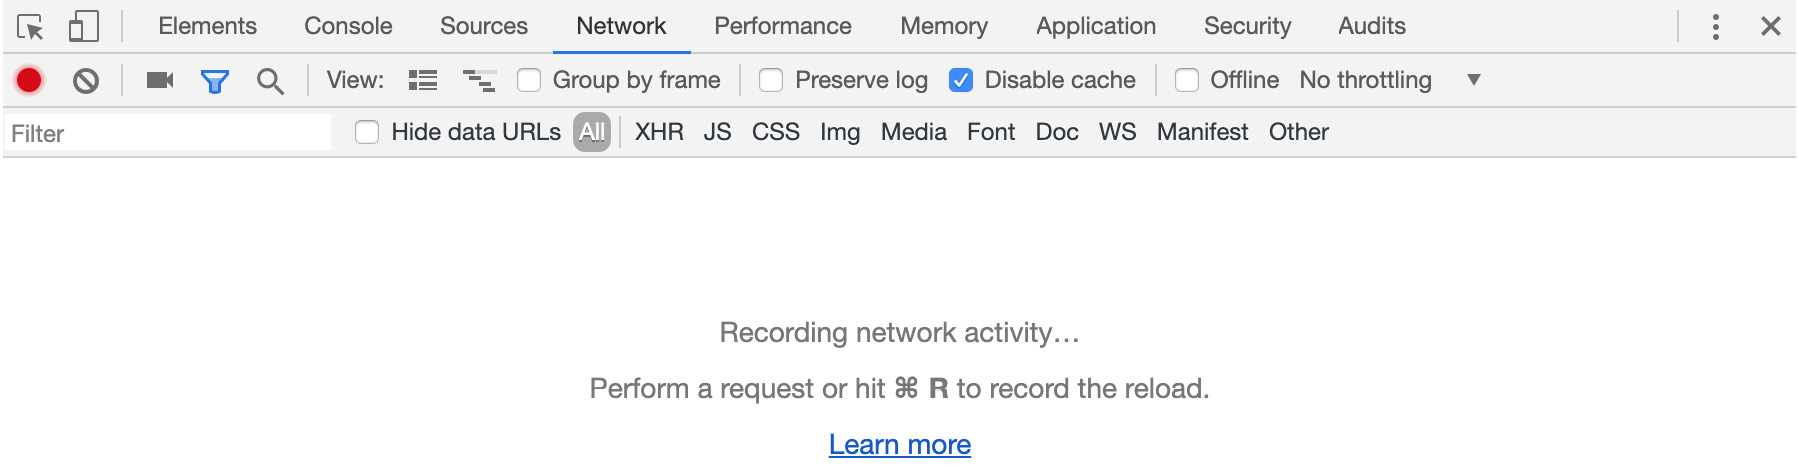 Figure 1.5: Google Chrome DevTools panel when open